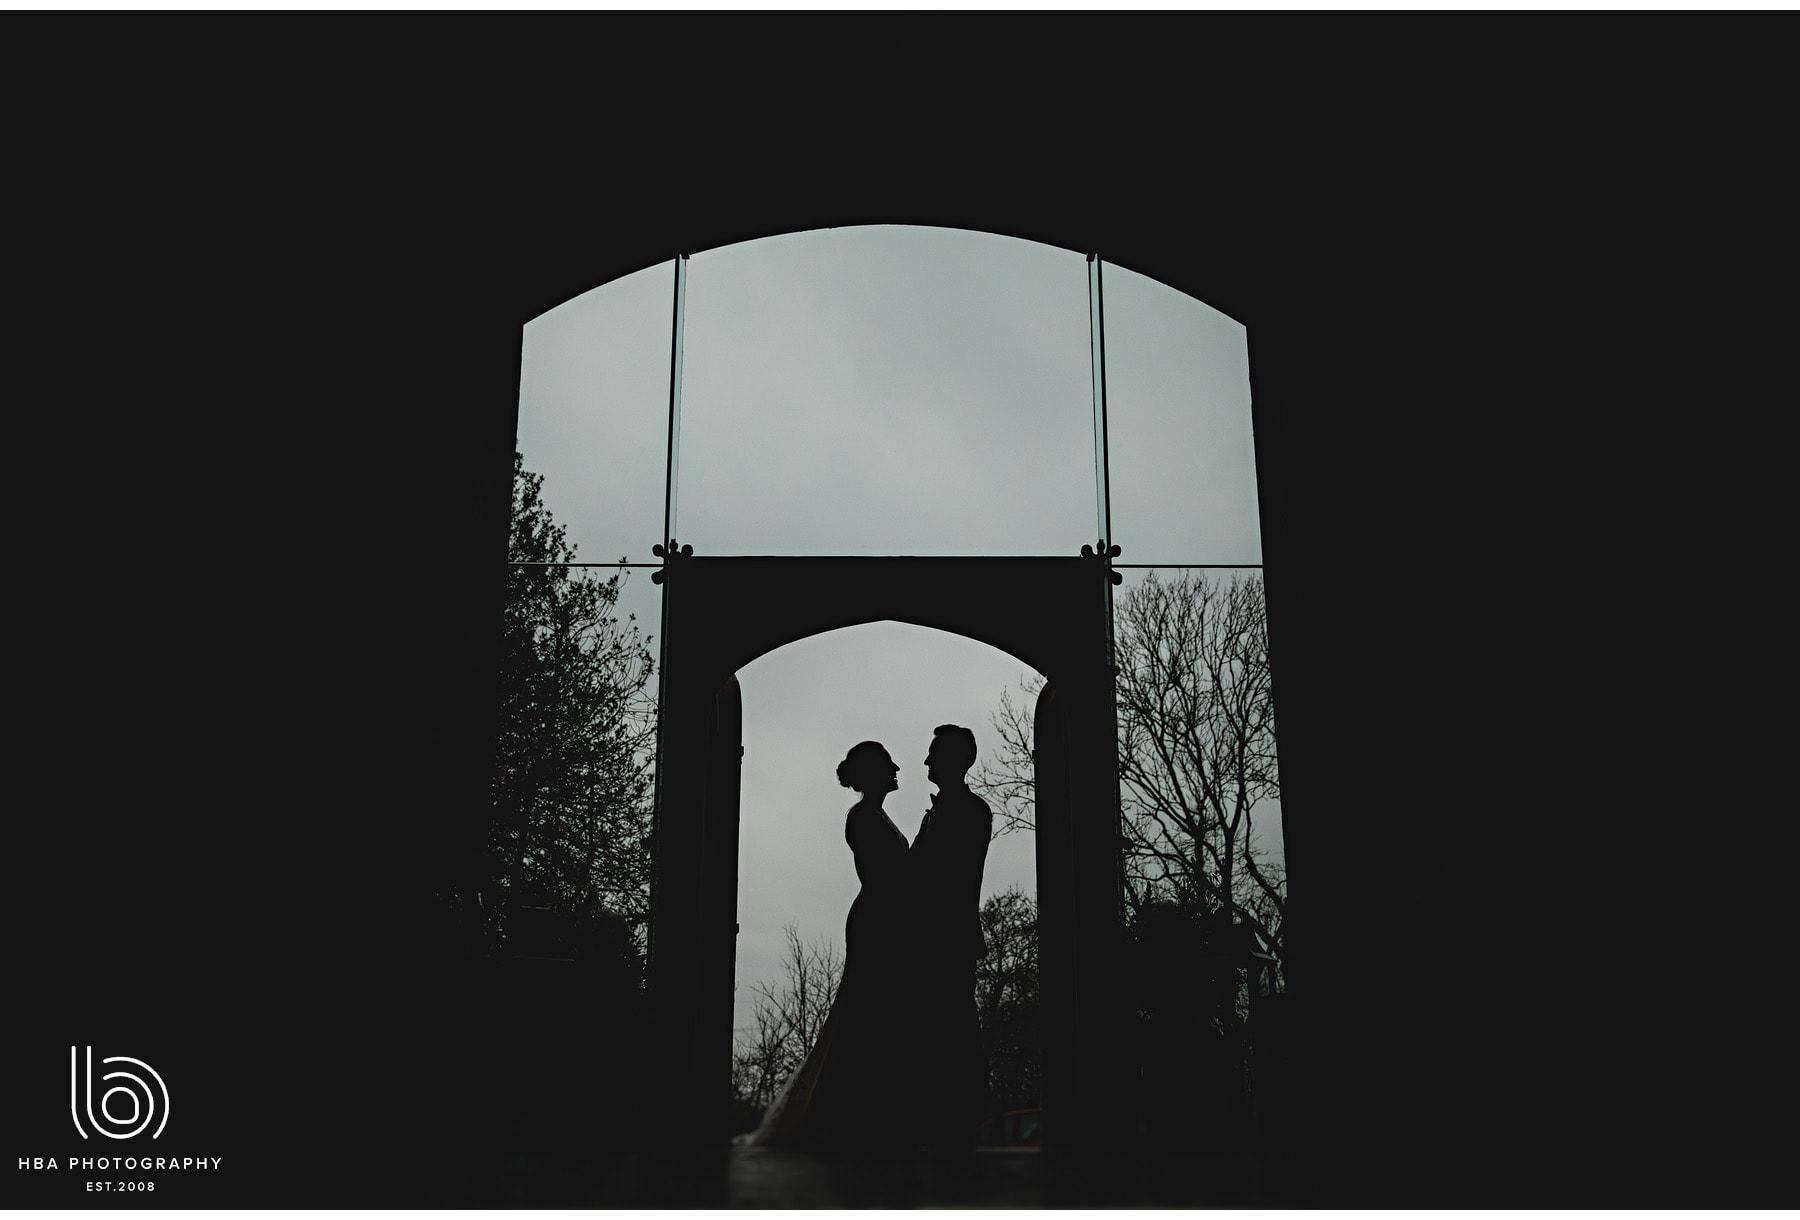 the bride & groom in silhouette